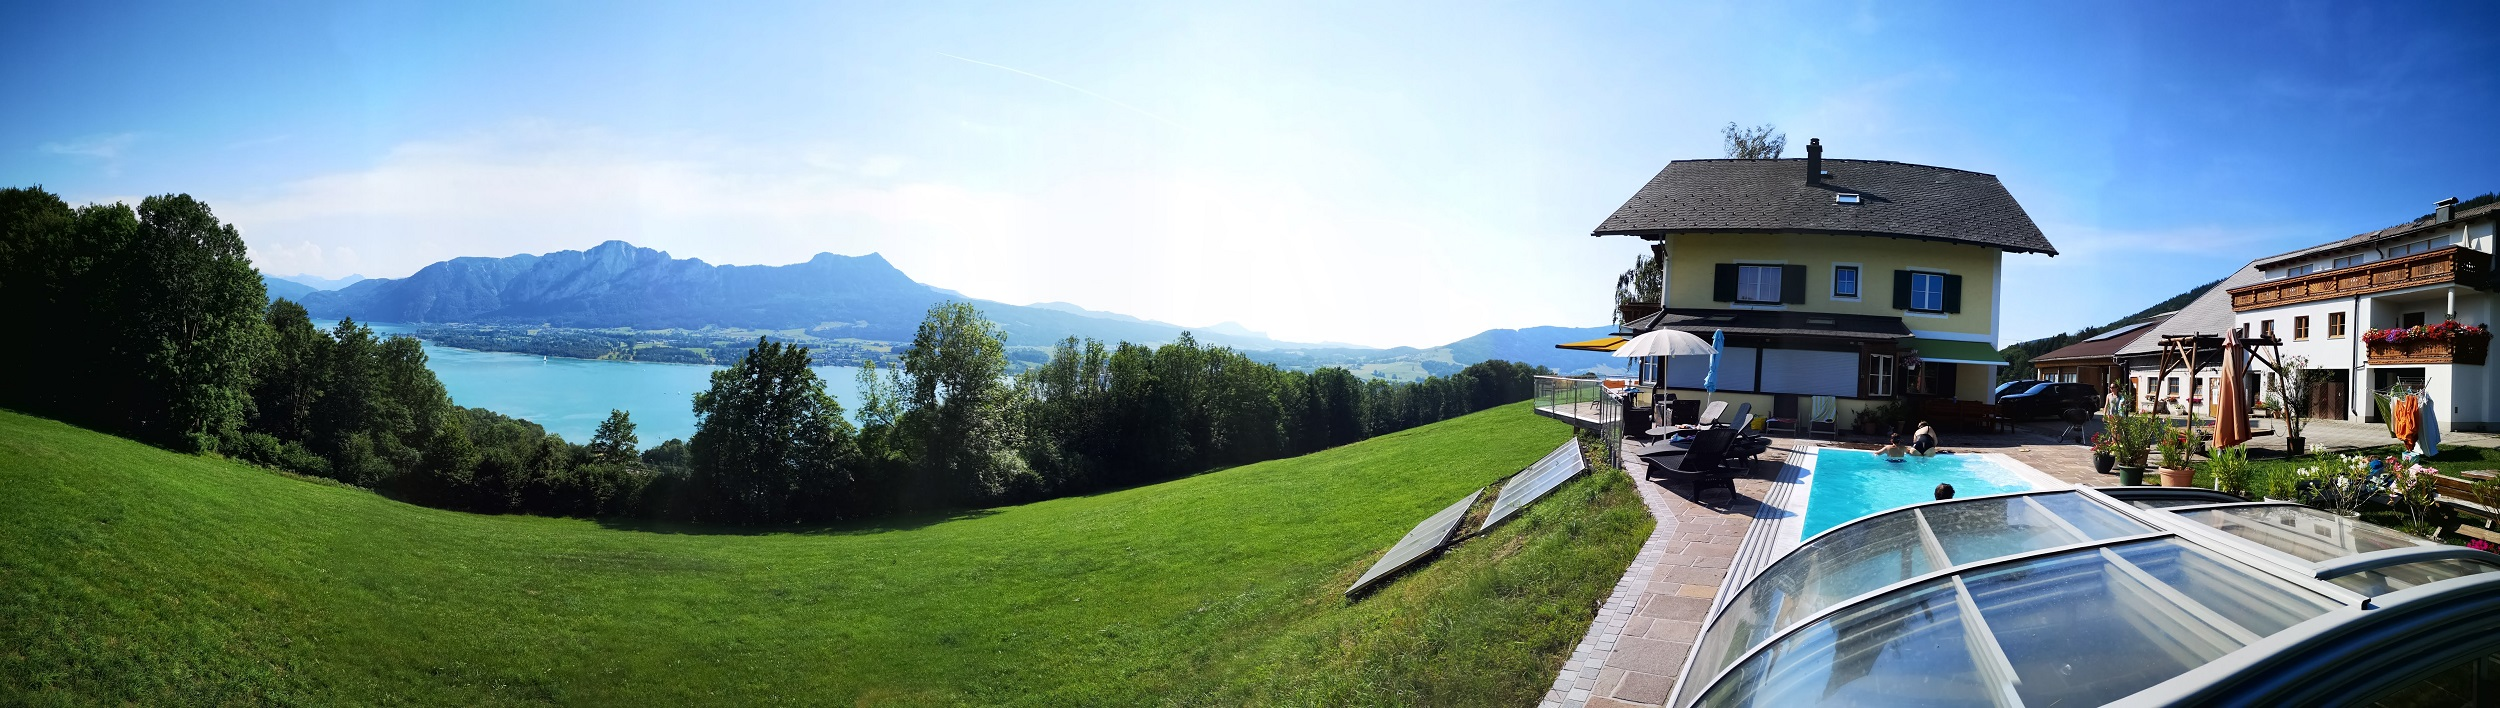 Panorma Mondseeberg Bauernhof ferienhof-gassner web1